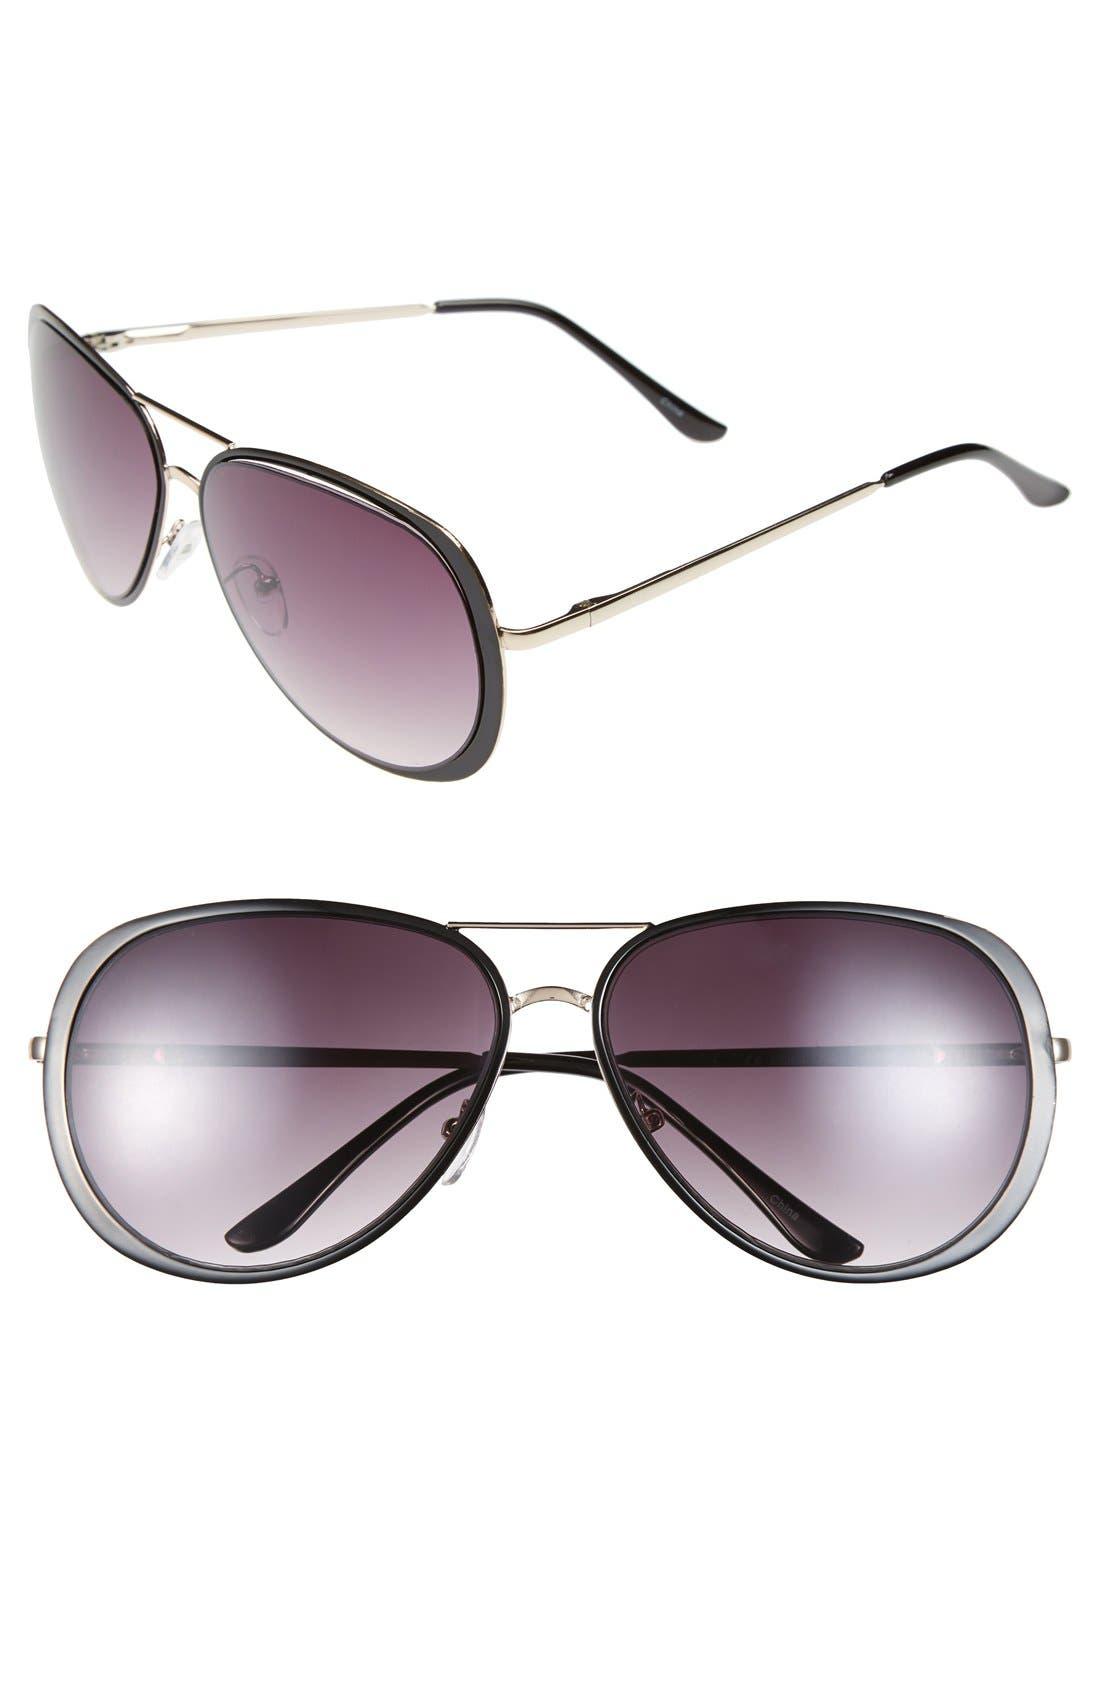 Main Image - Icon Eyewear 60mm Metal Aviator Sunglasses